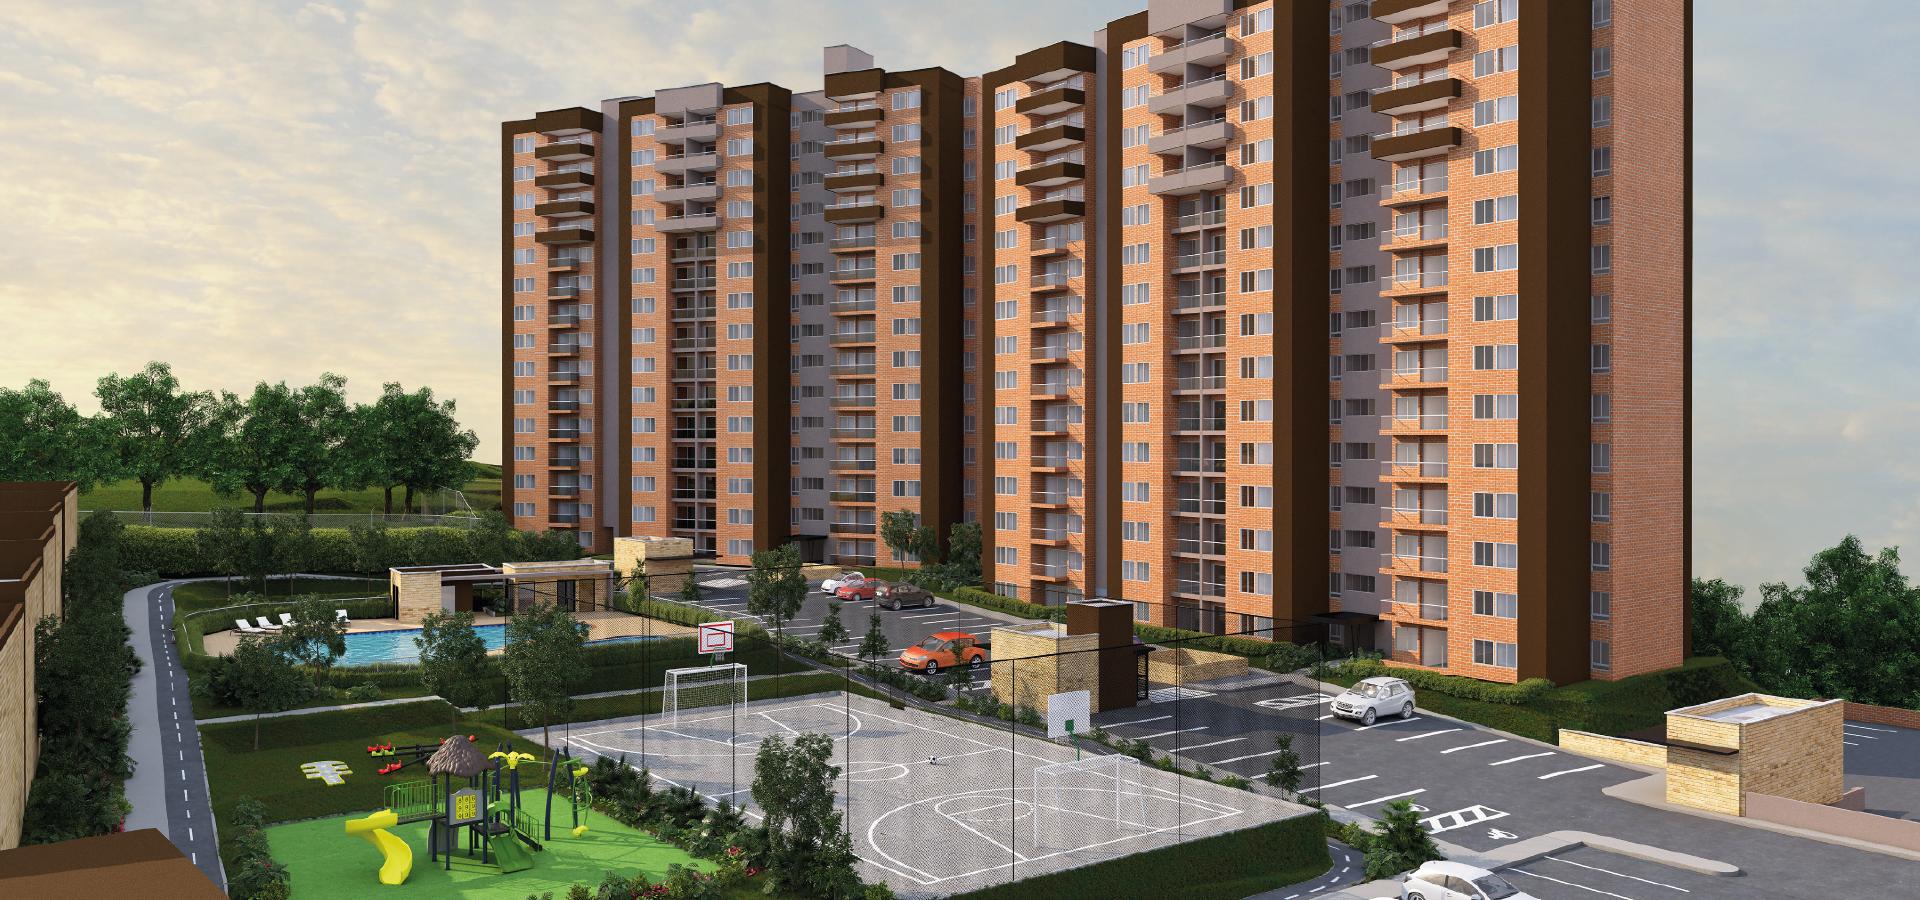 Casa o Apartamento ¿Cuál elegir?